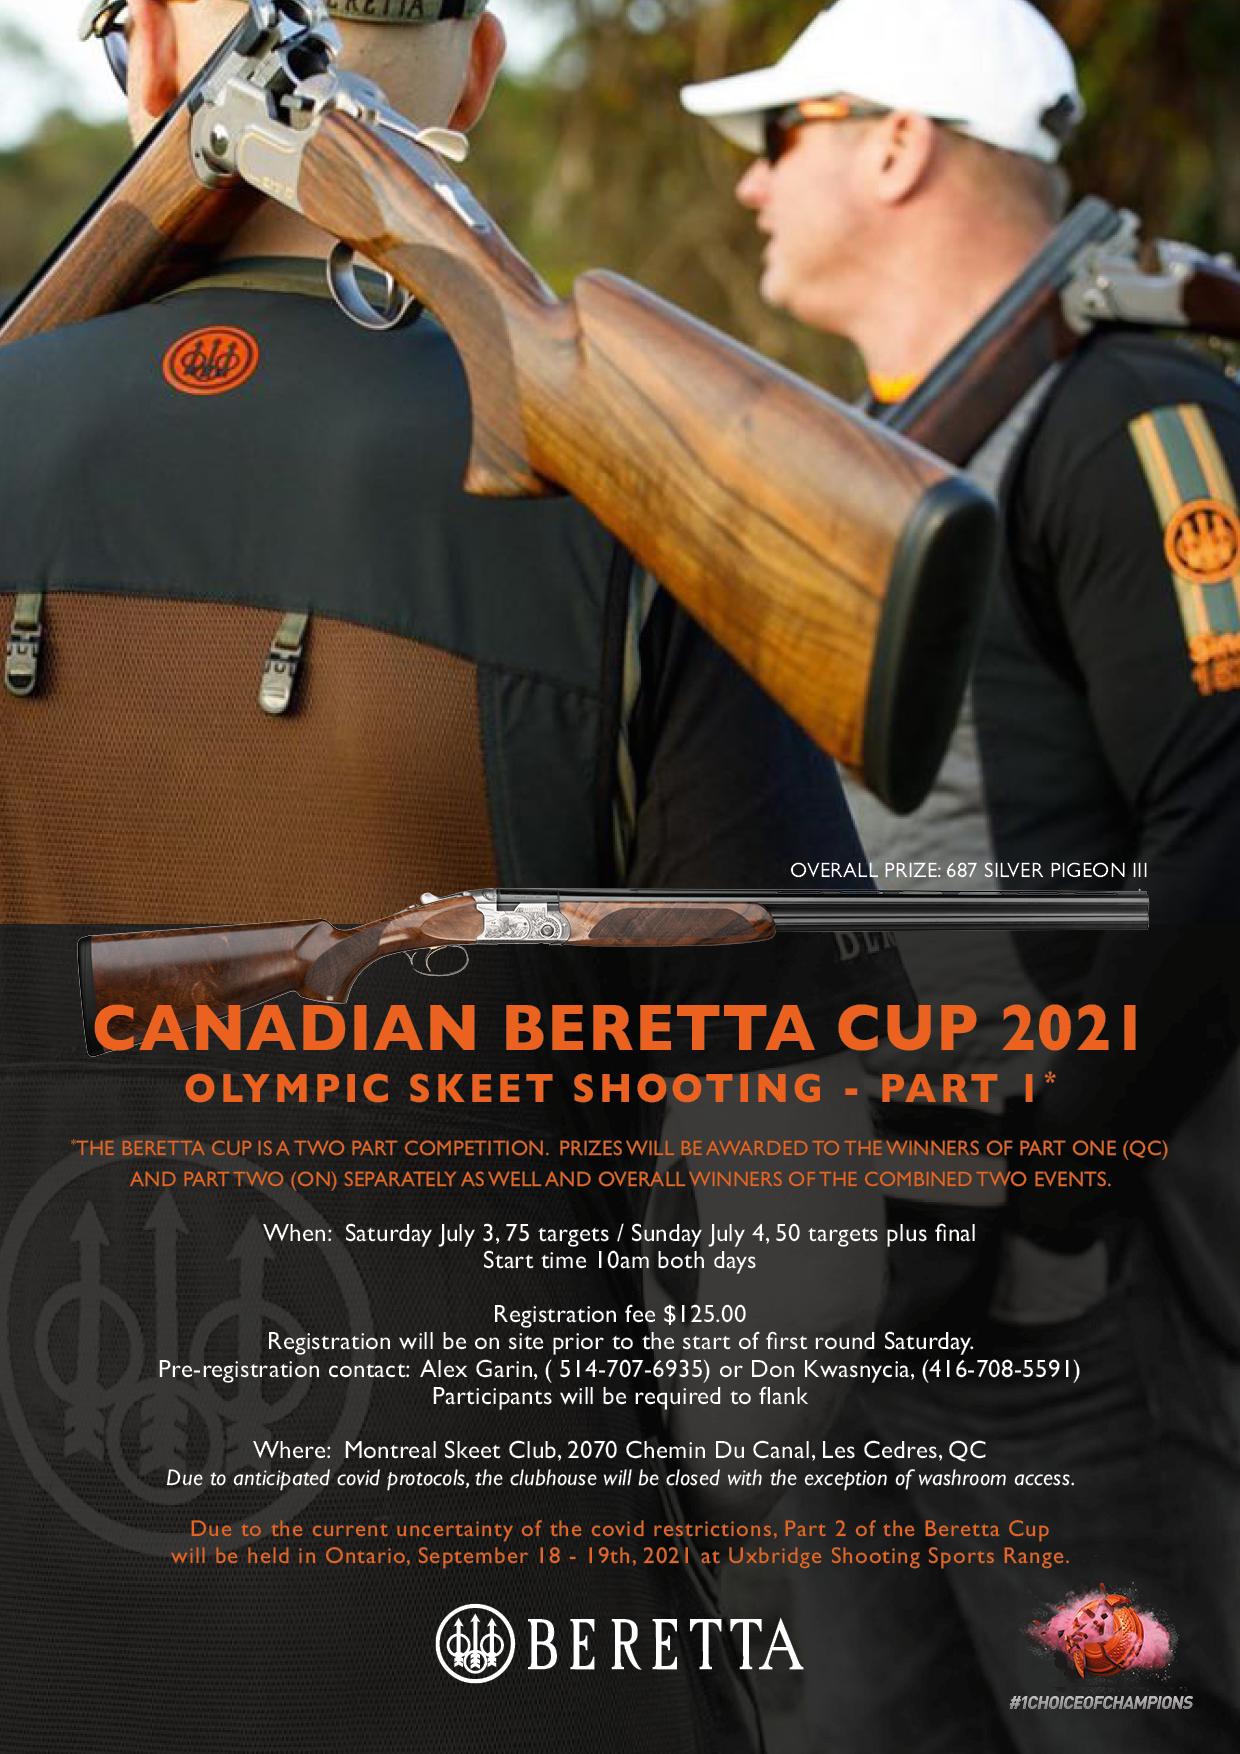 Beretta Canadian Olympic Skeet Cup 2021